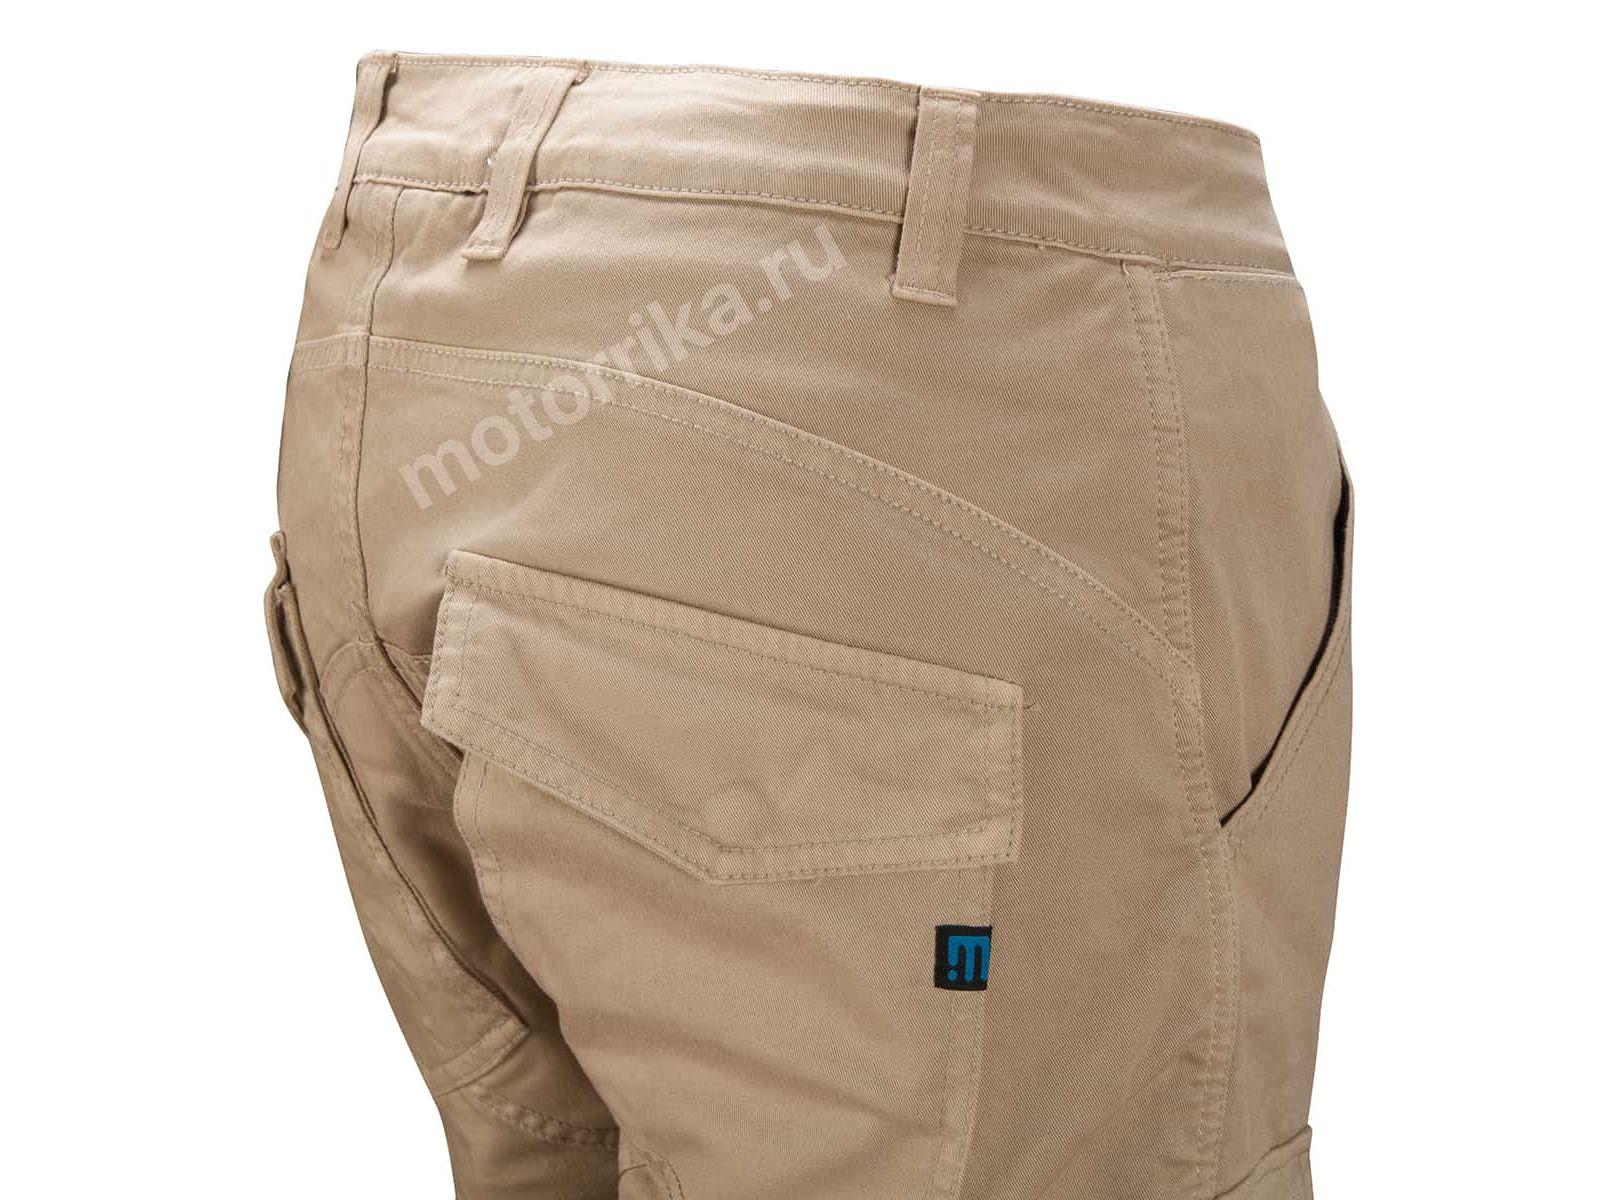 Мотобрюки PROmo Jeans Santiago Sand